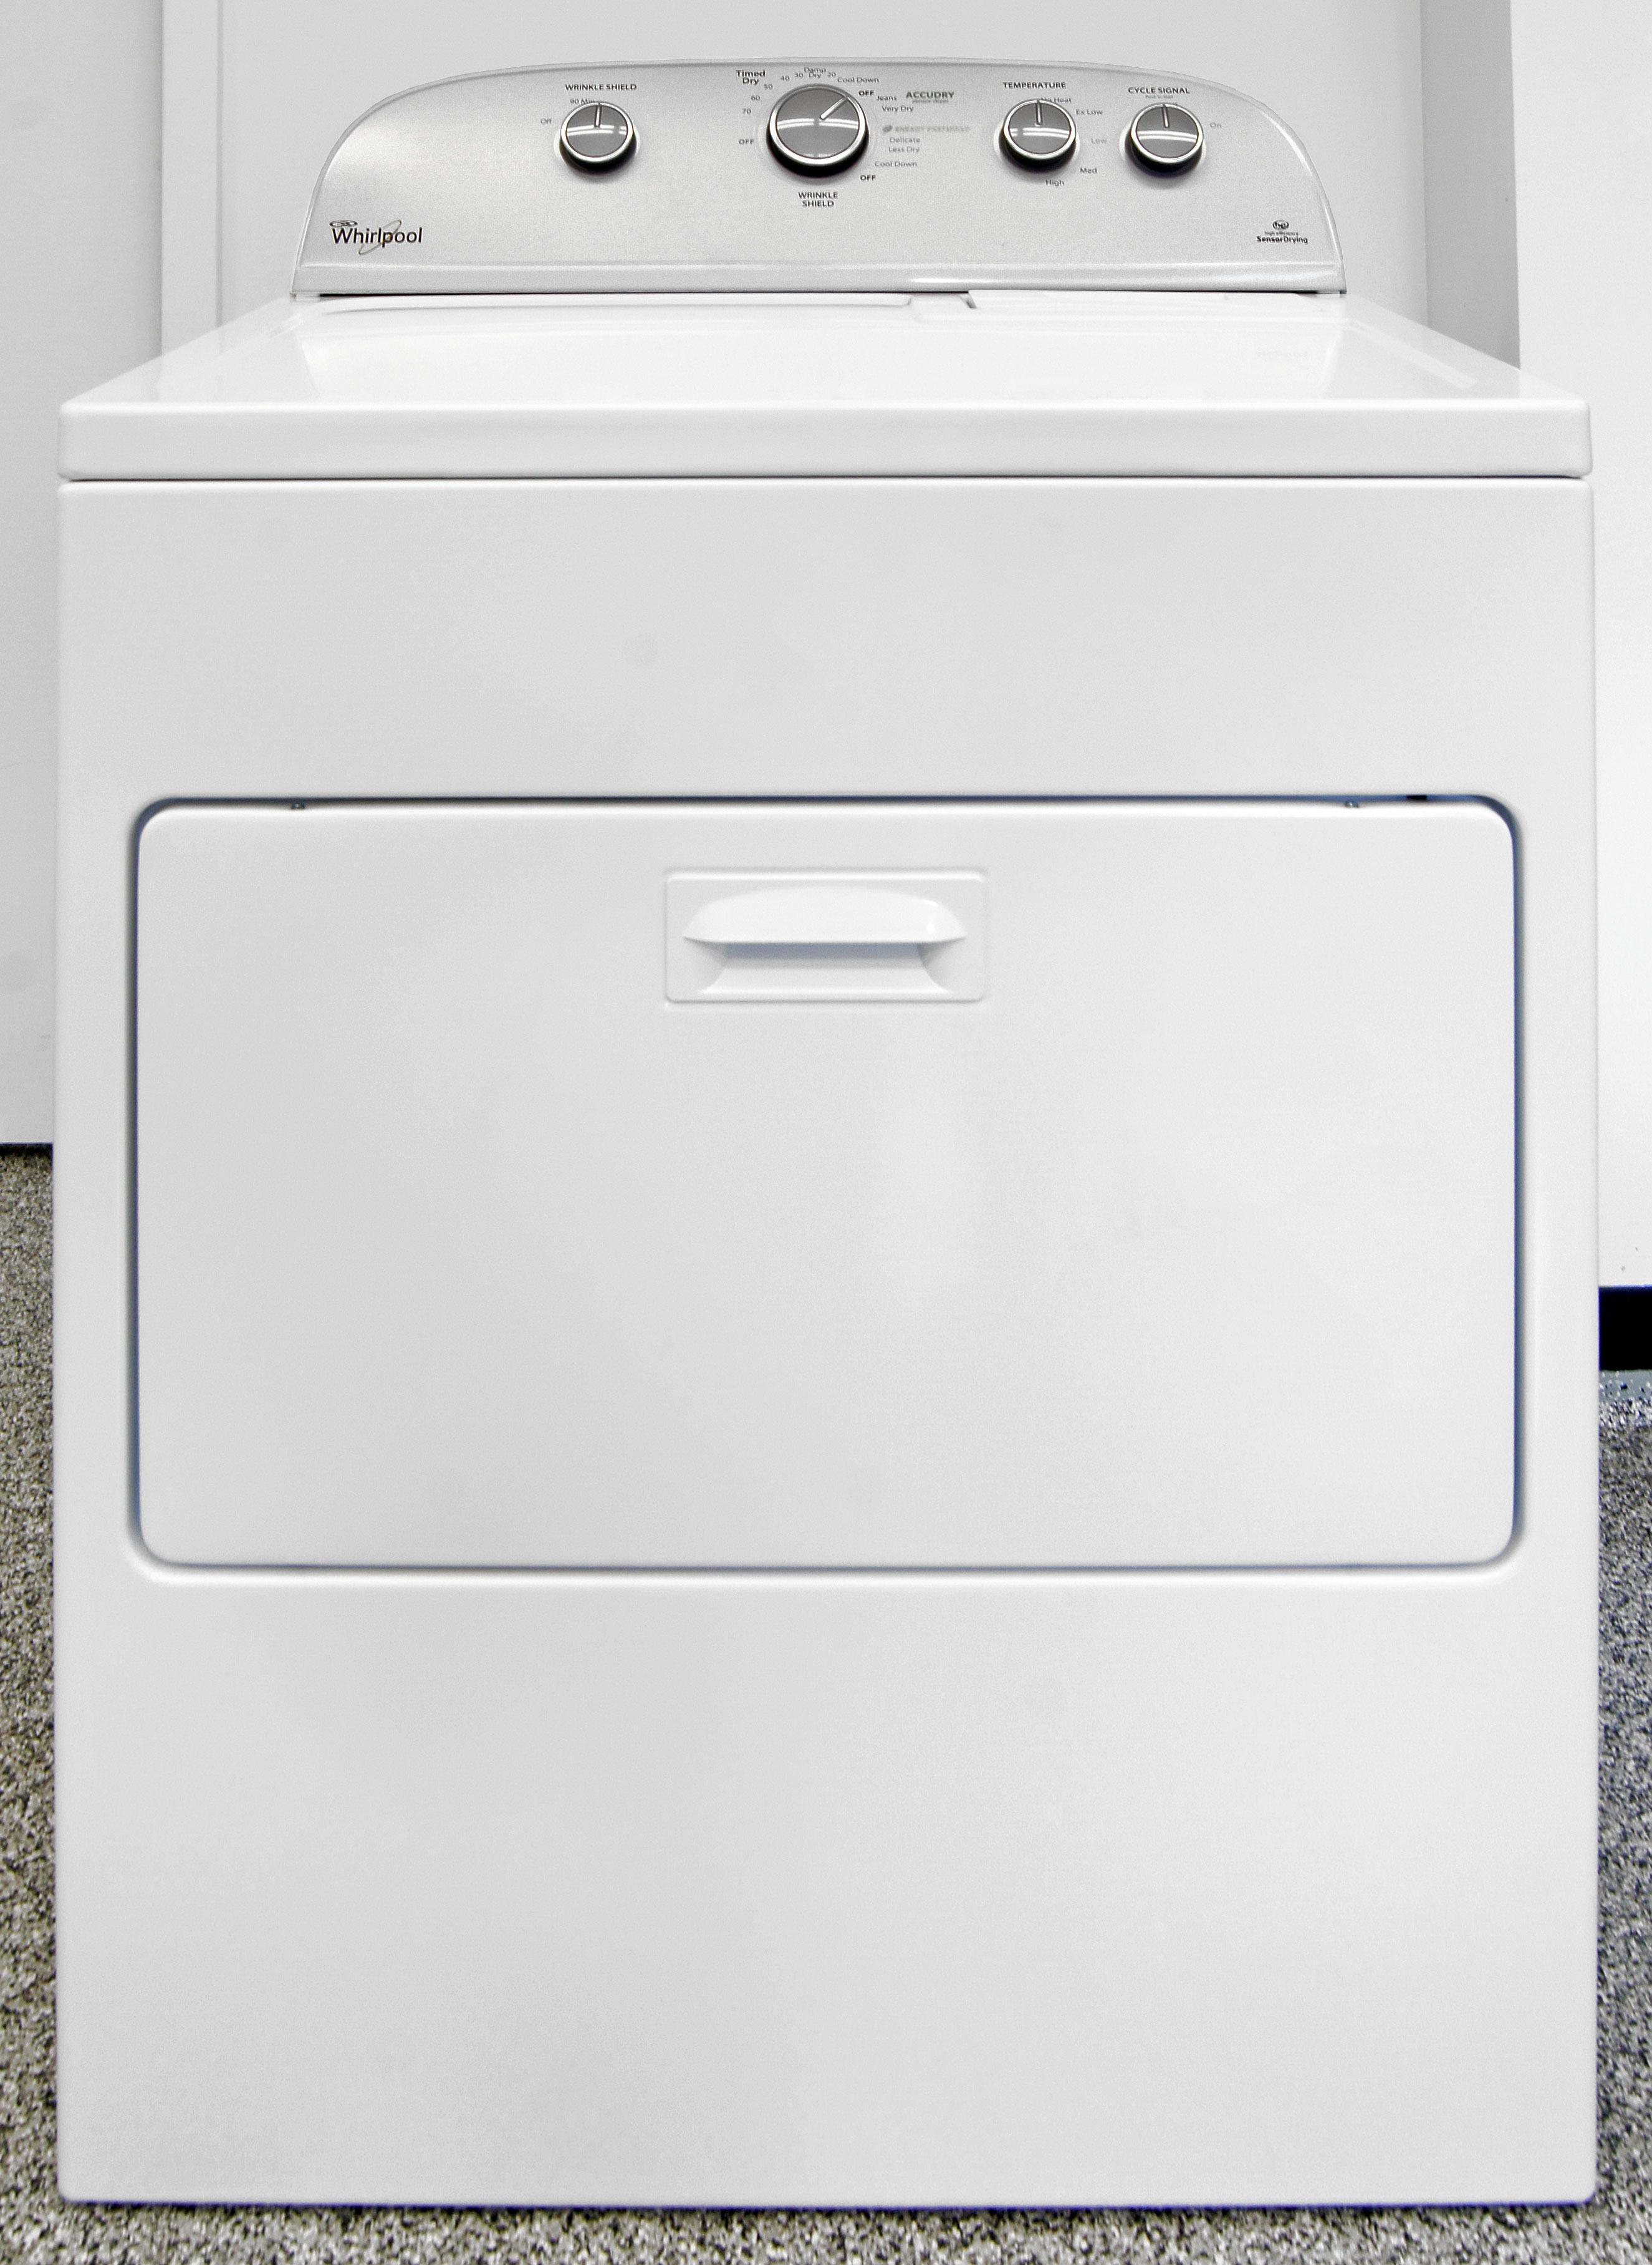 The Whirlpool WED5000EW is an old-school, white and grey hamper door dryer.